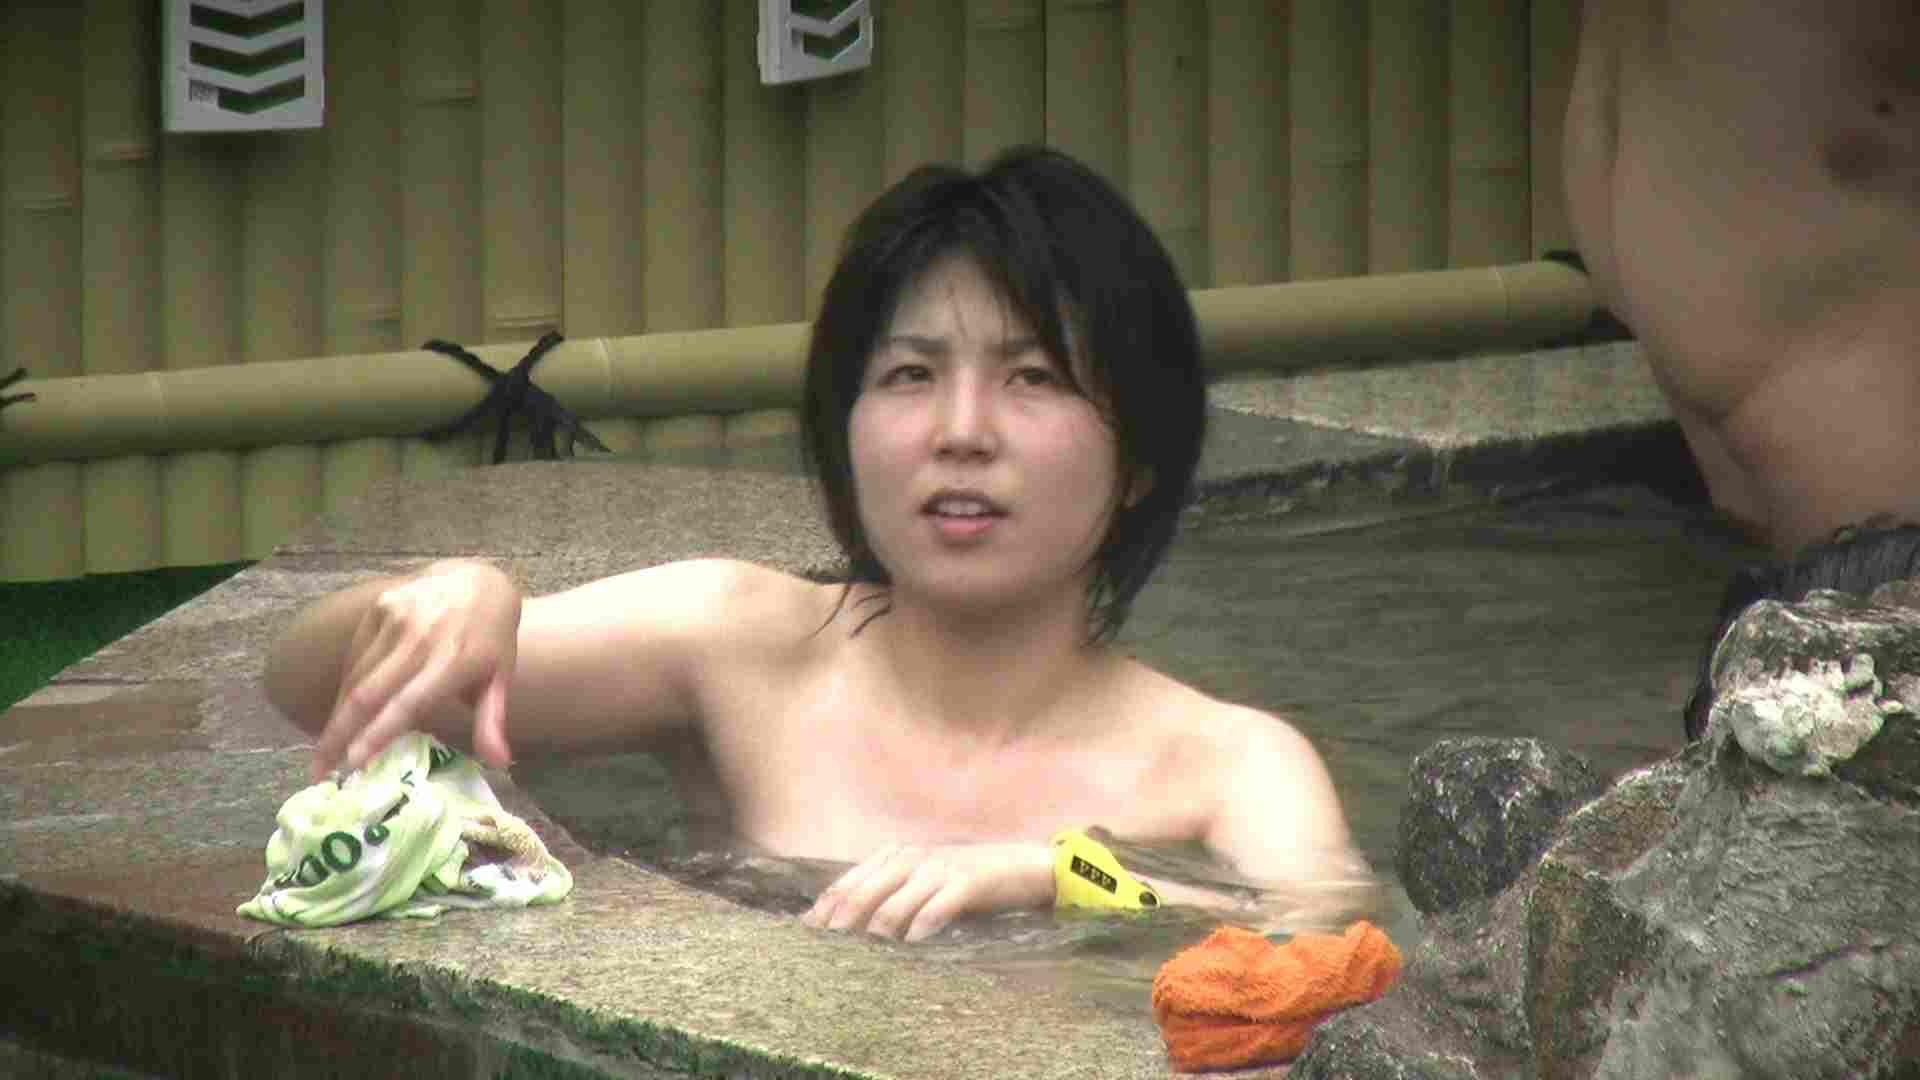 Aquaな露天風呂Vol.188 盗撮師作品  105pic 54